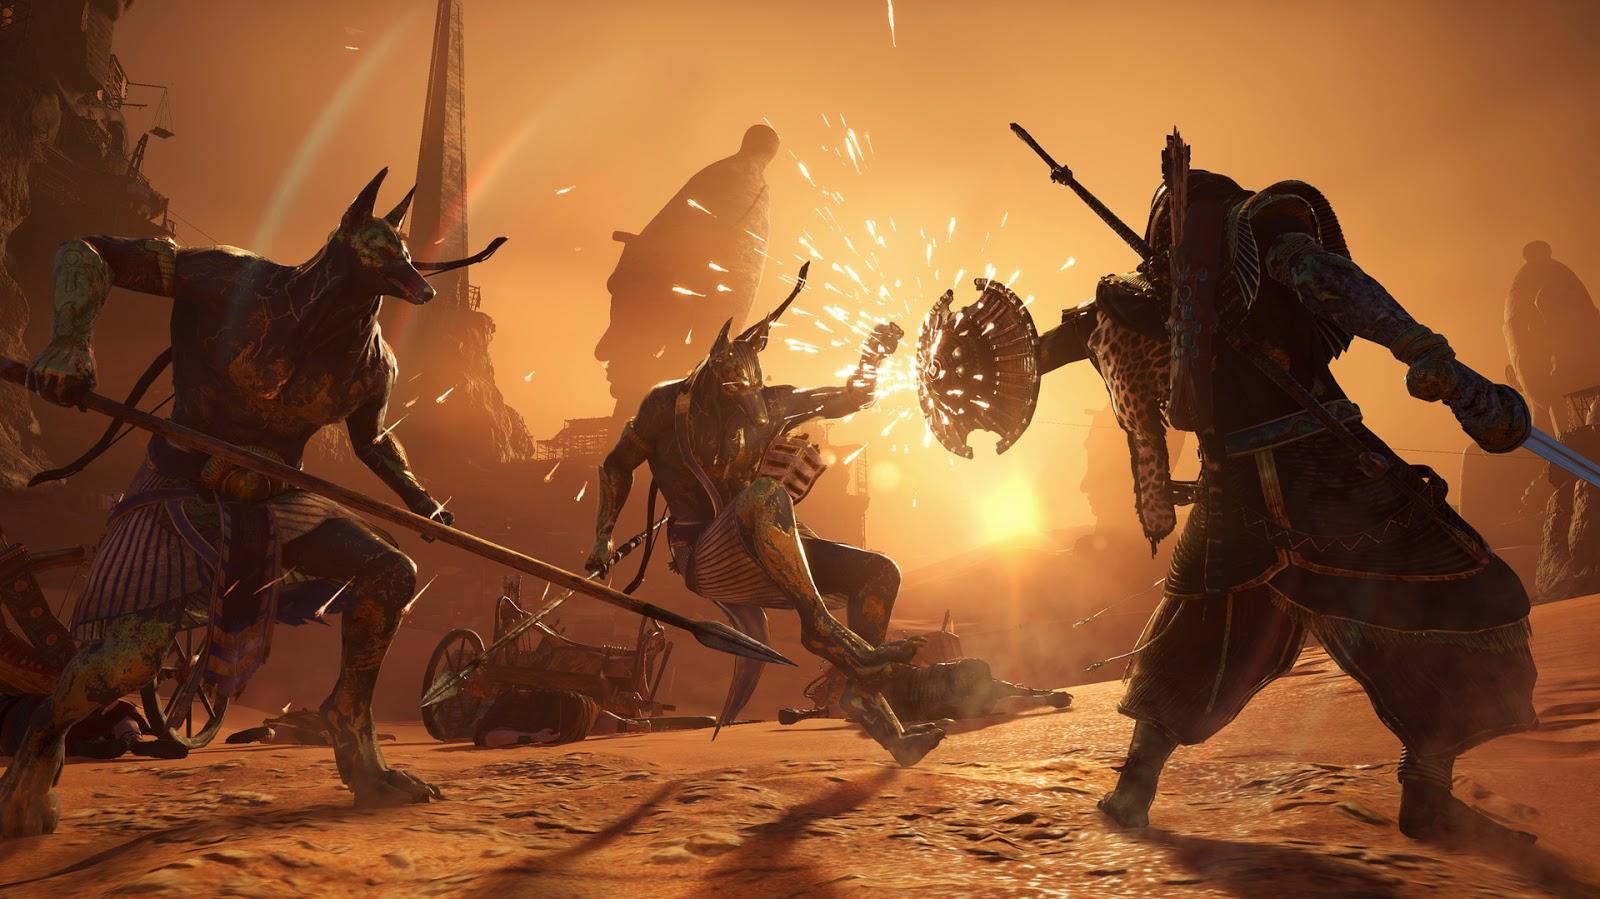 Assassin's Creed Origins The Curse Of The Pharaohs PC ESPAÑOL + Crackfix (CODEX) + REPACK 11 DVD5 (JPW) 5